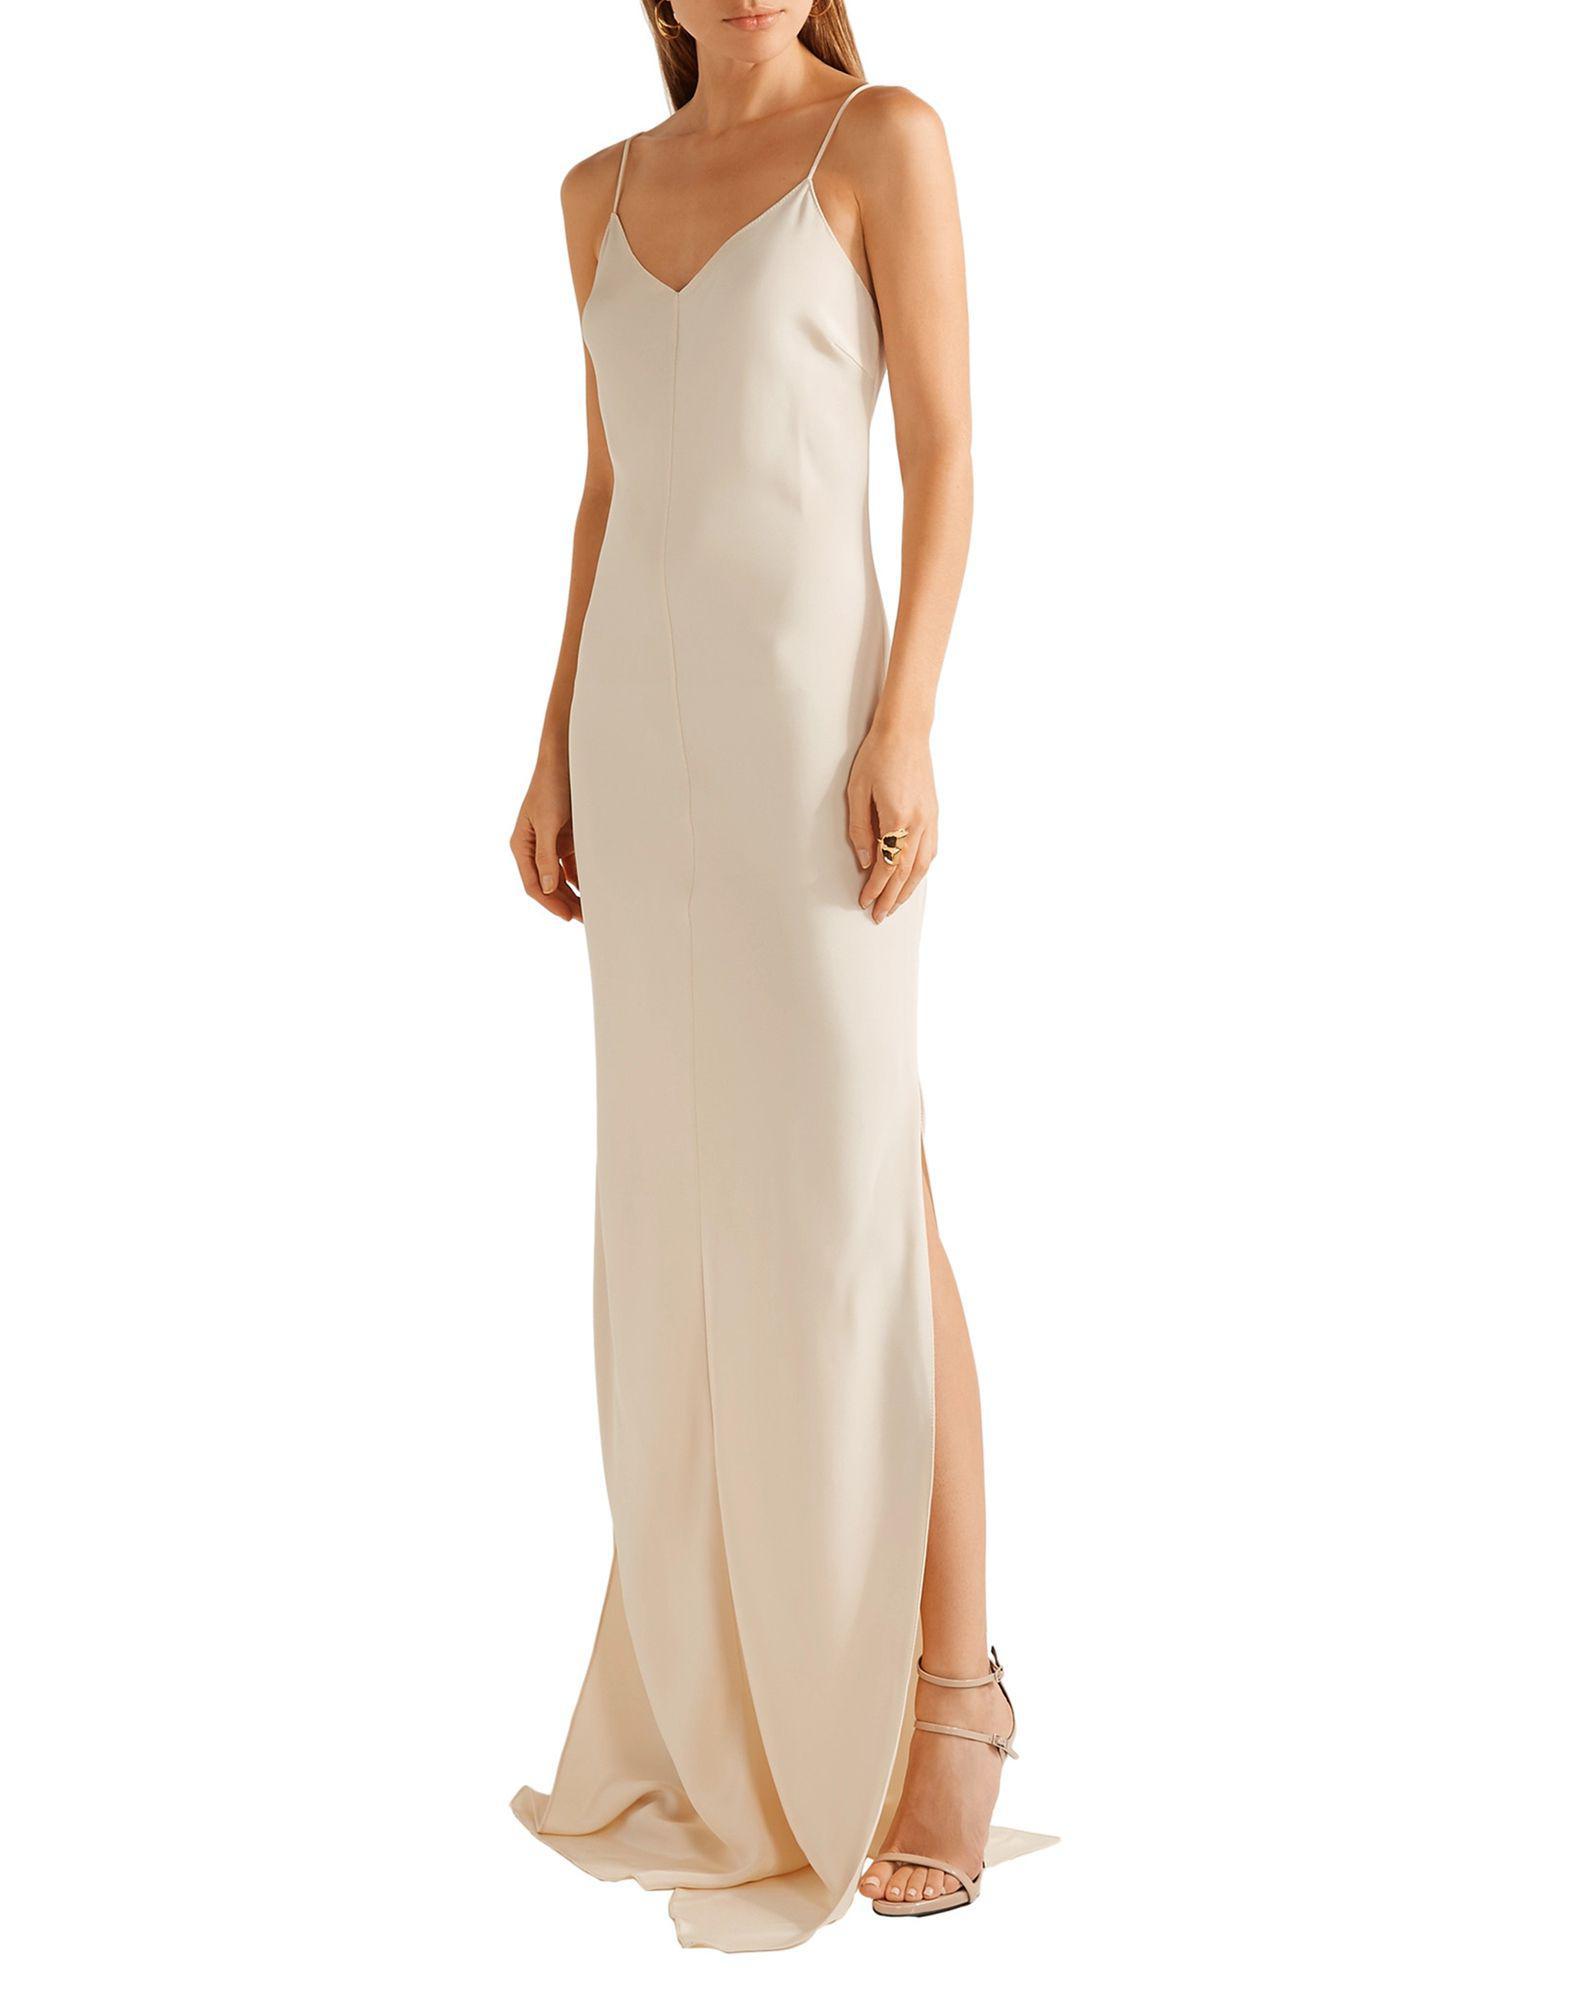 3593292a7f56 Lyst - Juan Carlos Obando Long Dress in White